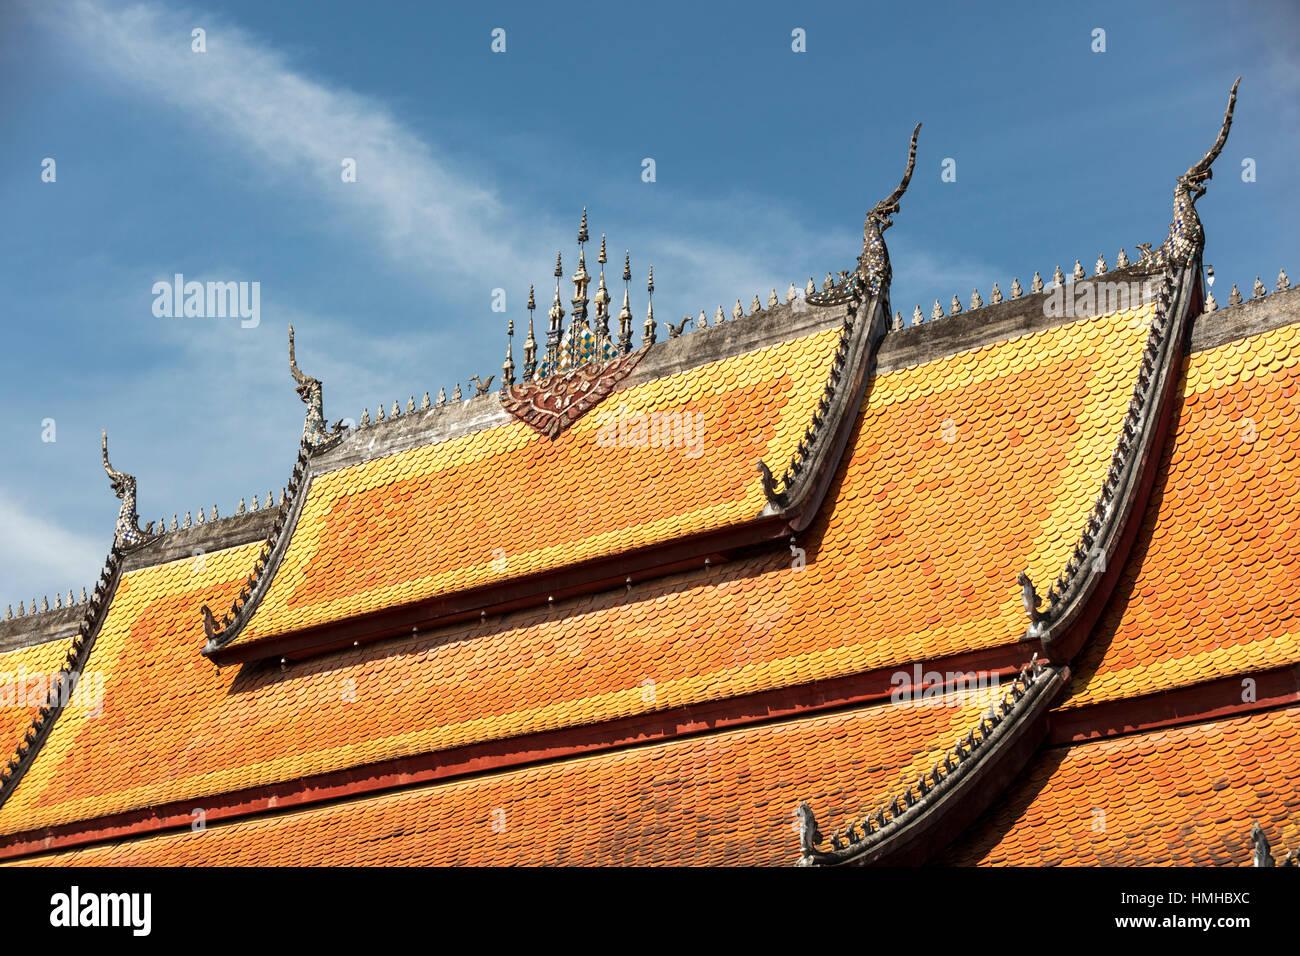 Tetto di Wat Sensouhkaram, Sakkarine Rd, Luang Prabang, Laos Immagini Stock